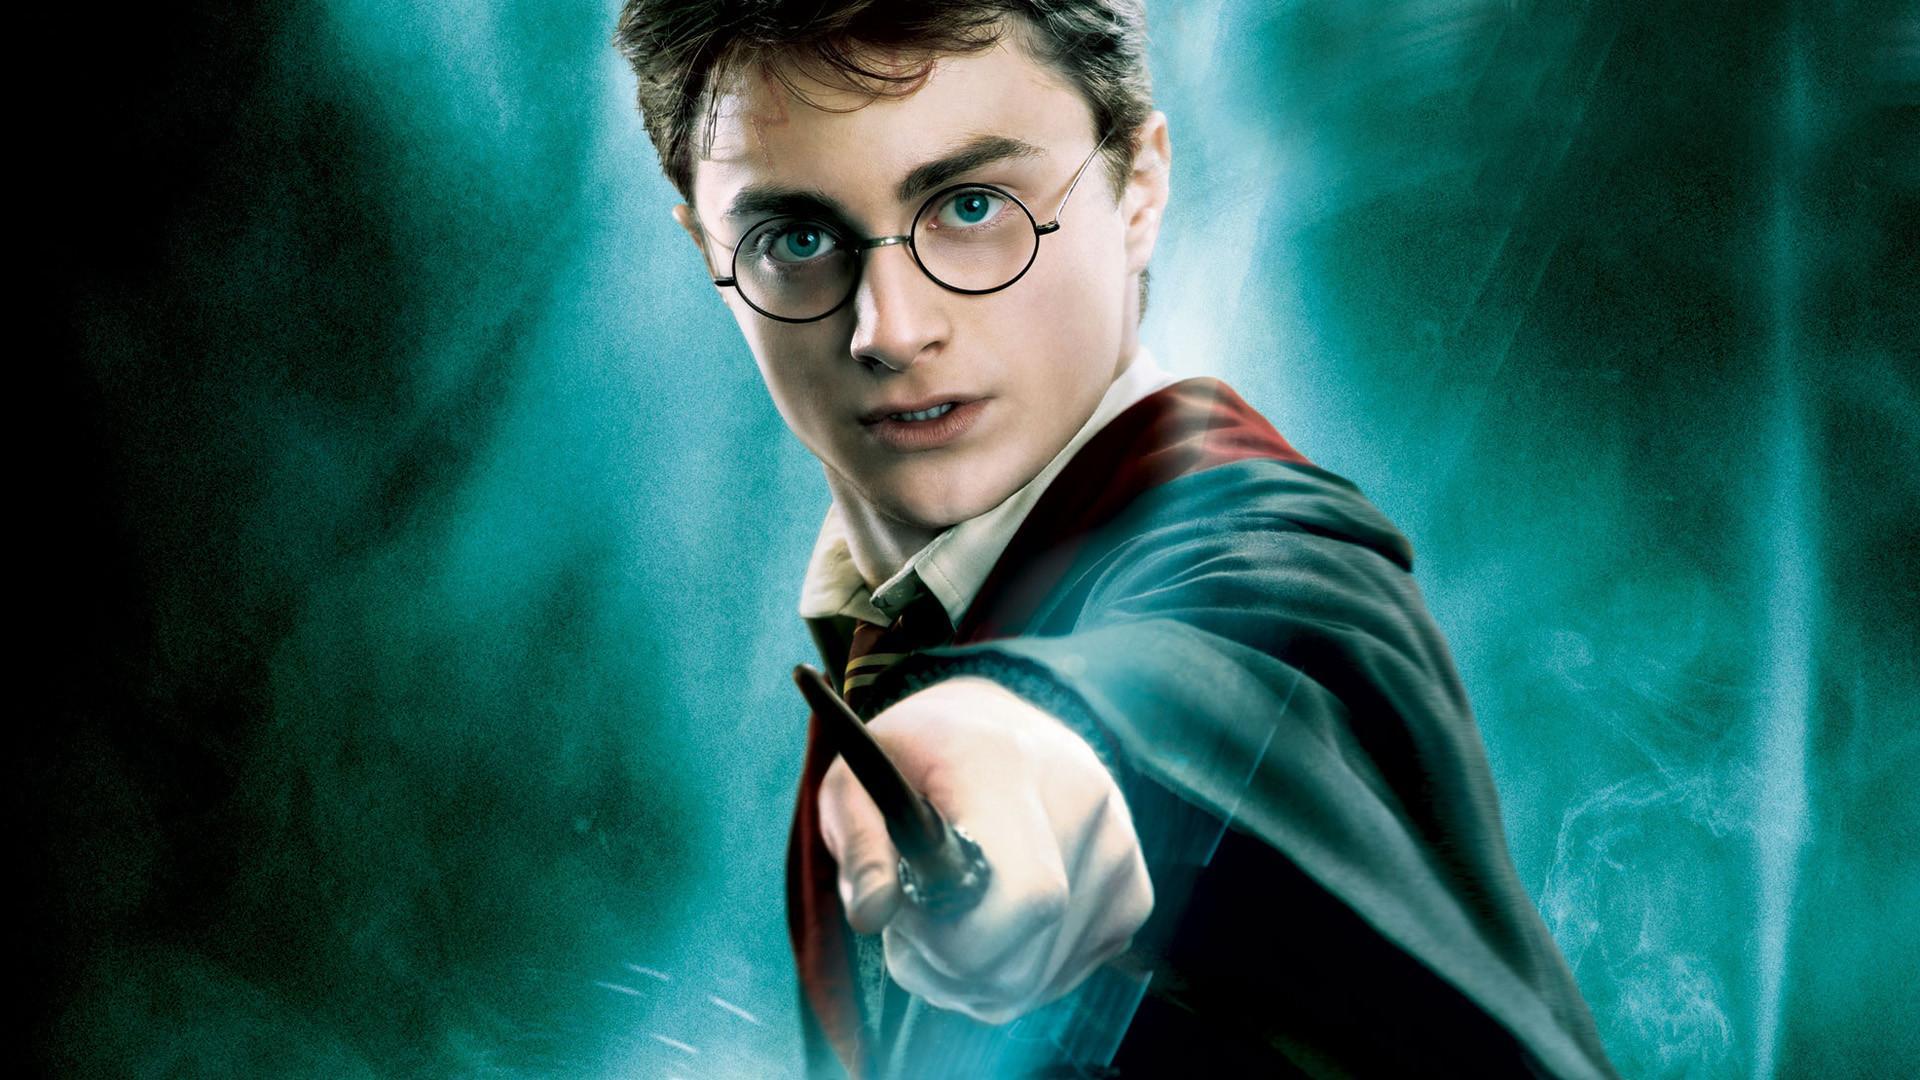 Cosa regalare ad un fan di Harry Potter? 4 idee regalo a tema Hogwarts